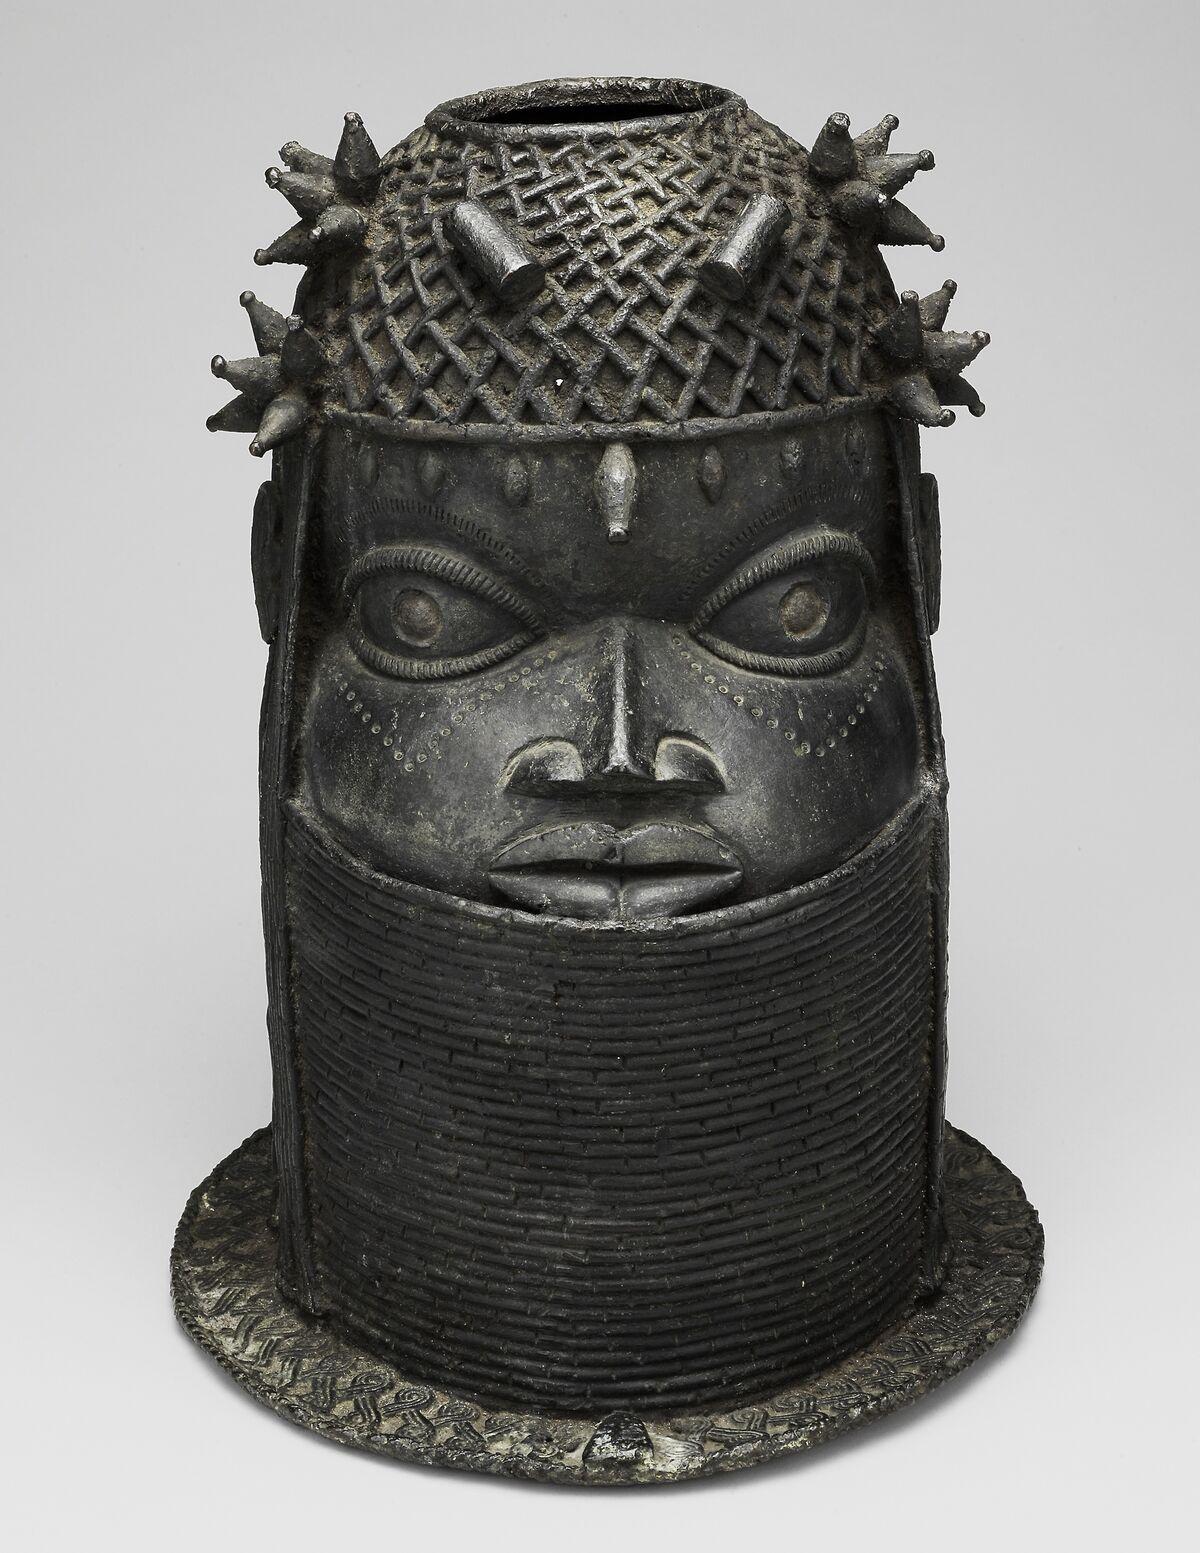 Head (Uhunmwun Elao), Edo, Kingdom of Benin, Nigeria, 1701–1825. Courtesy of The Art Institute of Chicago.